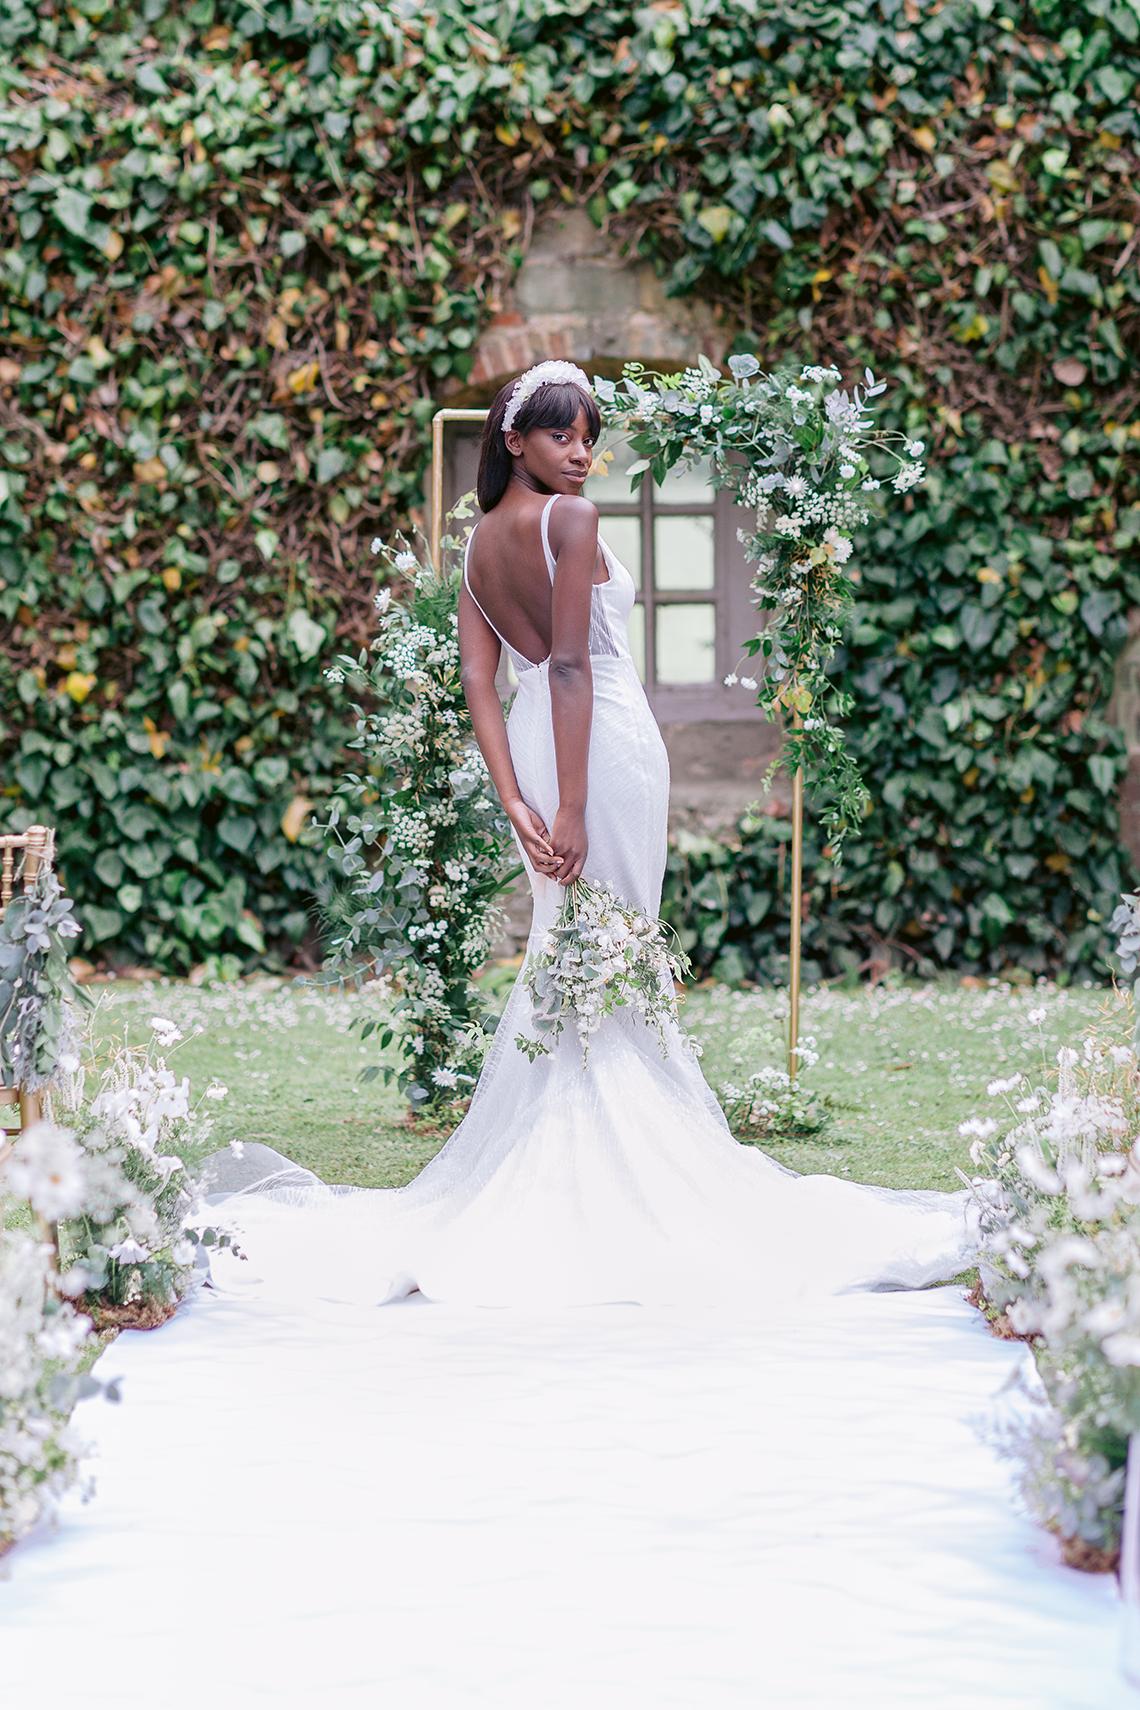 Elegant British Garden Inspired Wedding Ideas at Newburgh Priory – Felisiti Greis – Elsie Love Photography 45